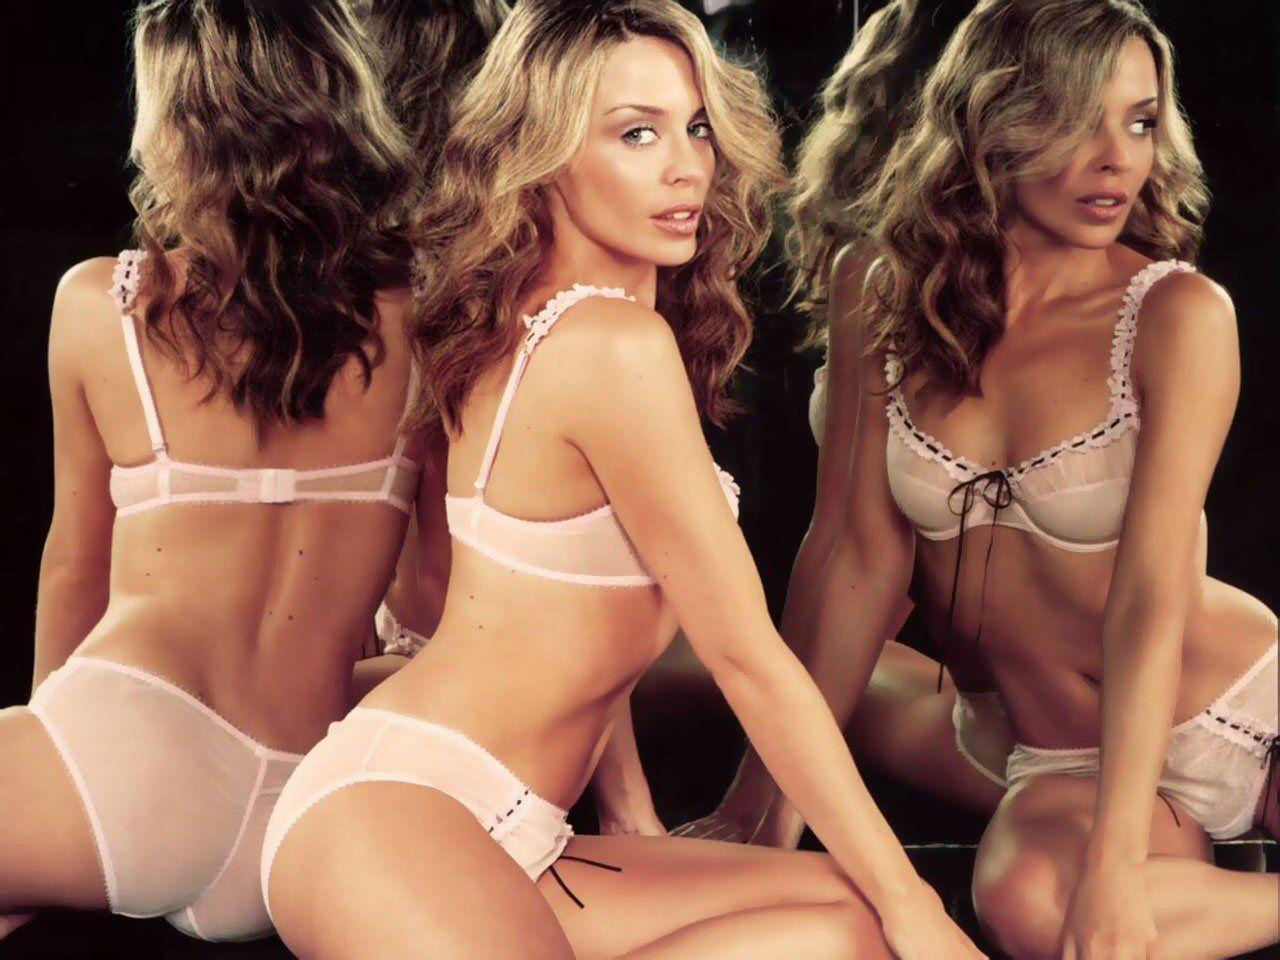 image Kylie minogue lingerie advert